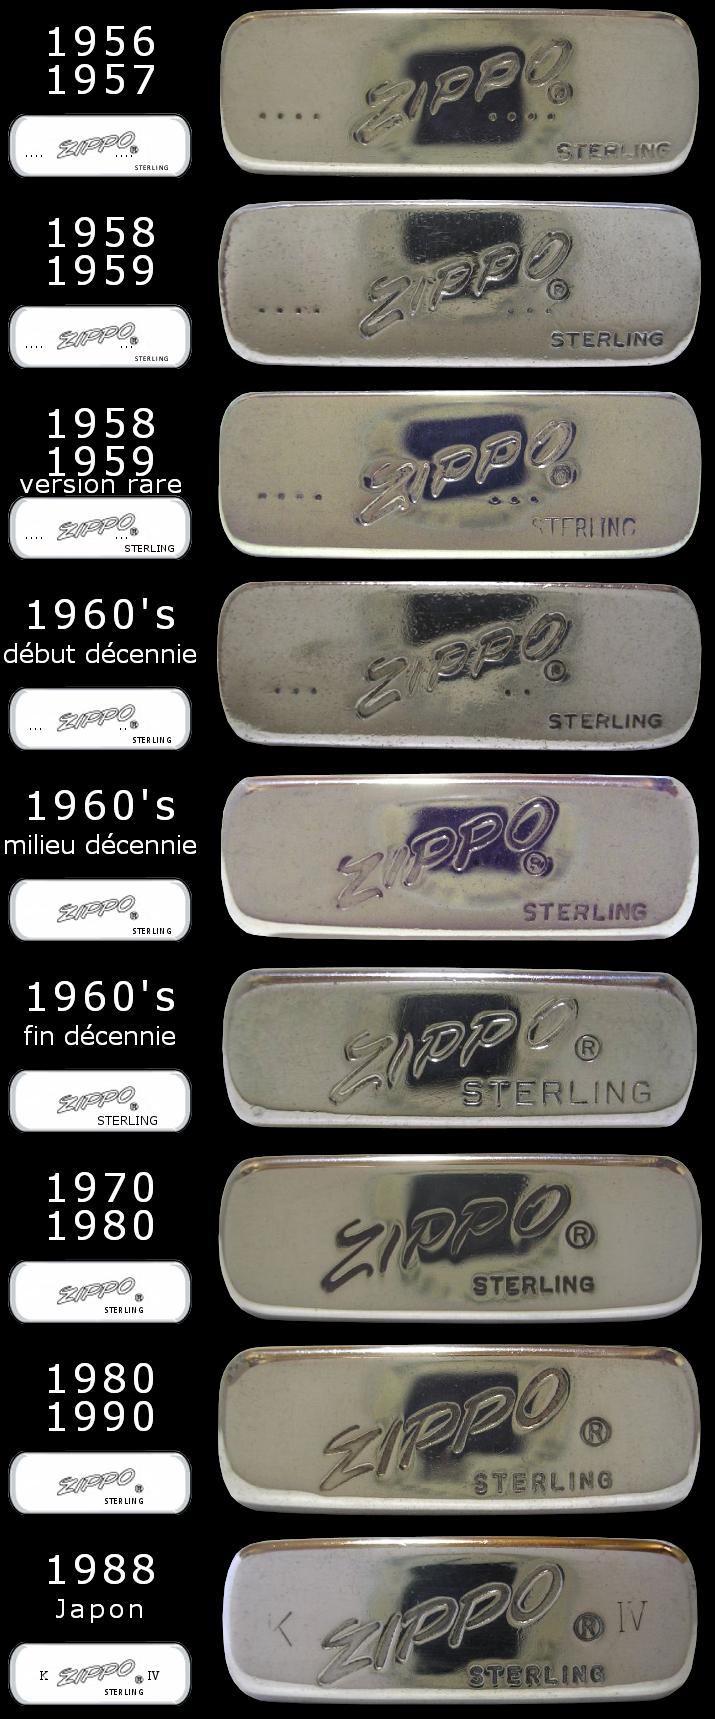 Datation - [Datation] Les Zippo Sterling Silver 1956-1990-523cf2c